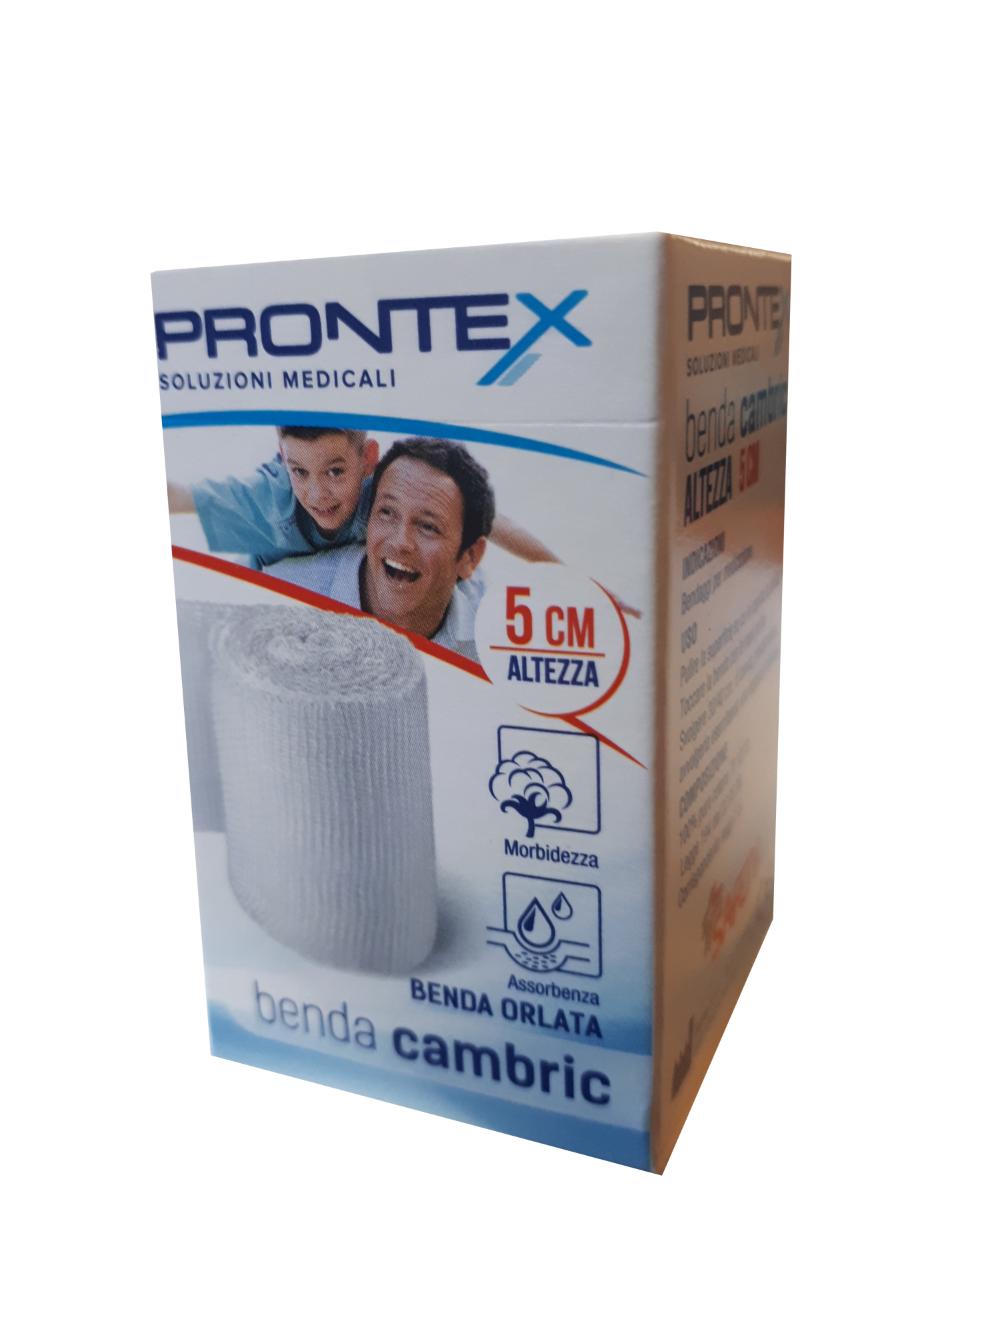 Safety Prontex Cambric Benda orlata h5cm